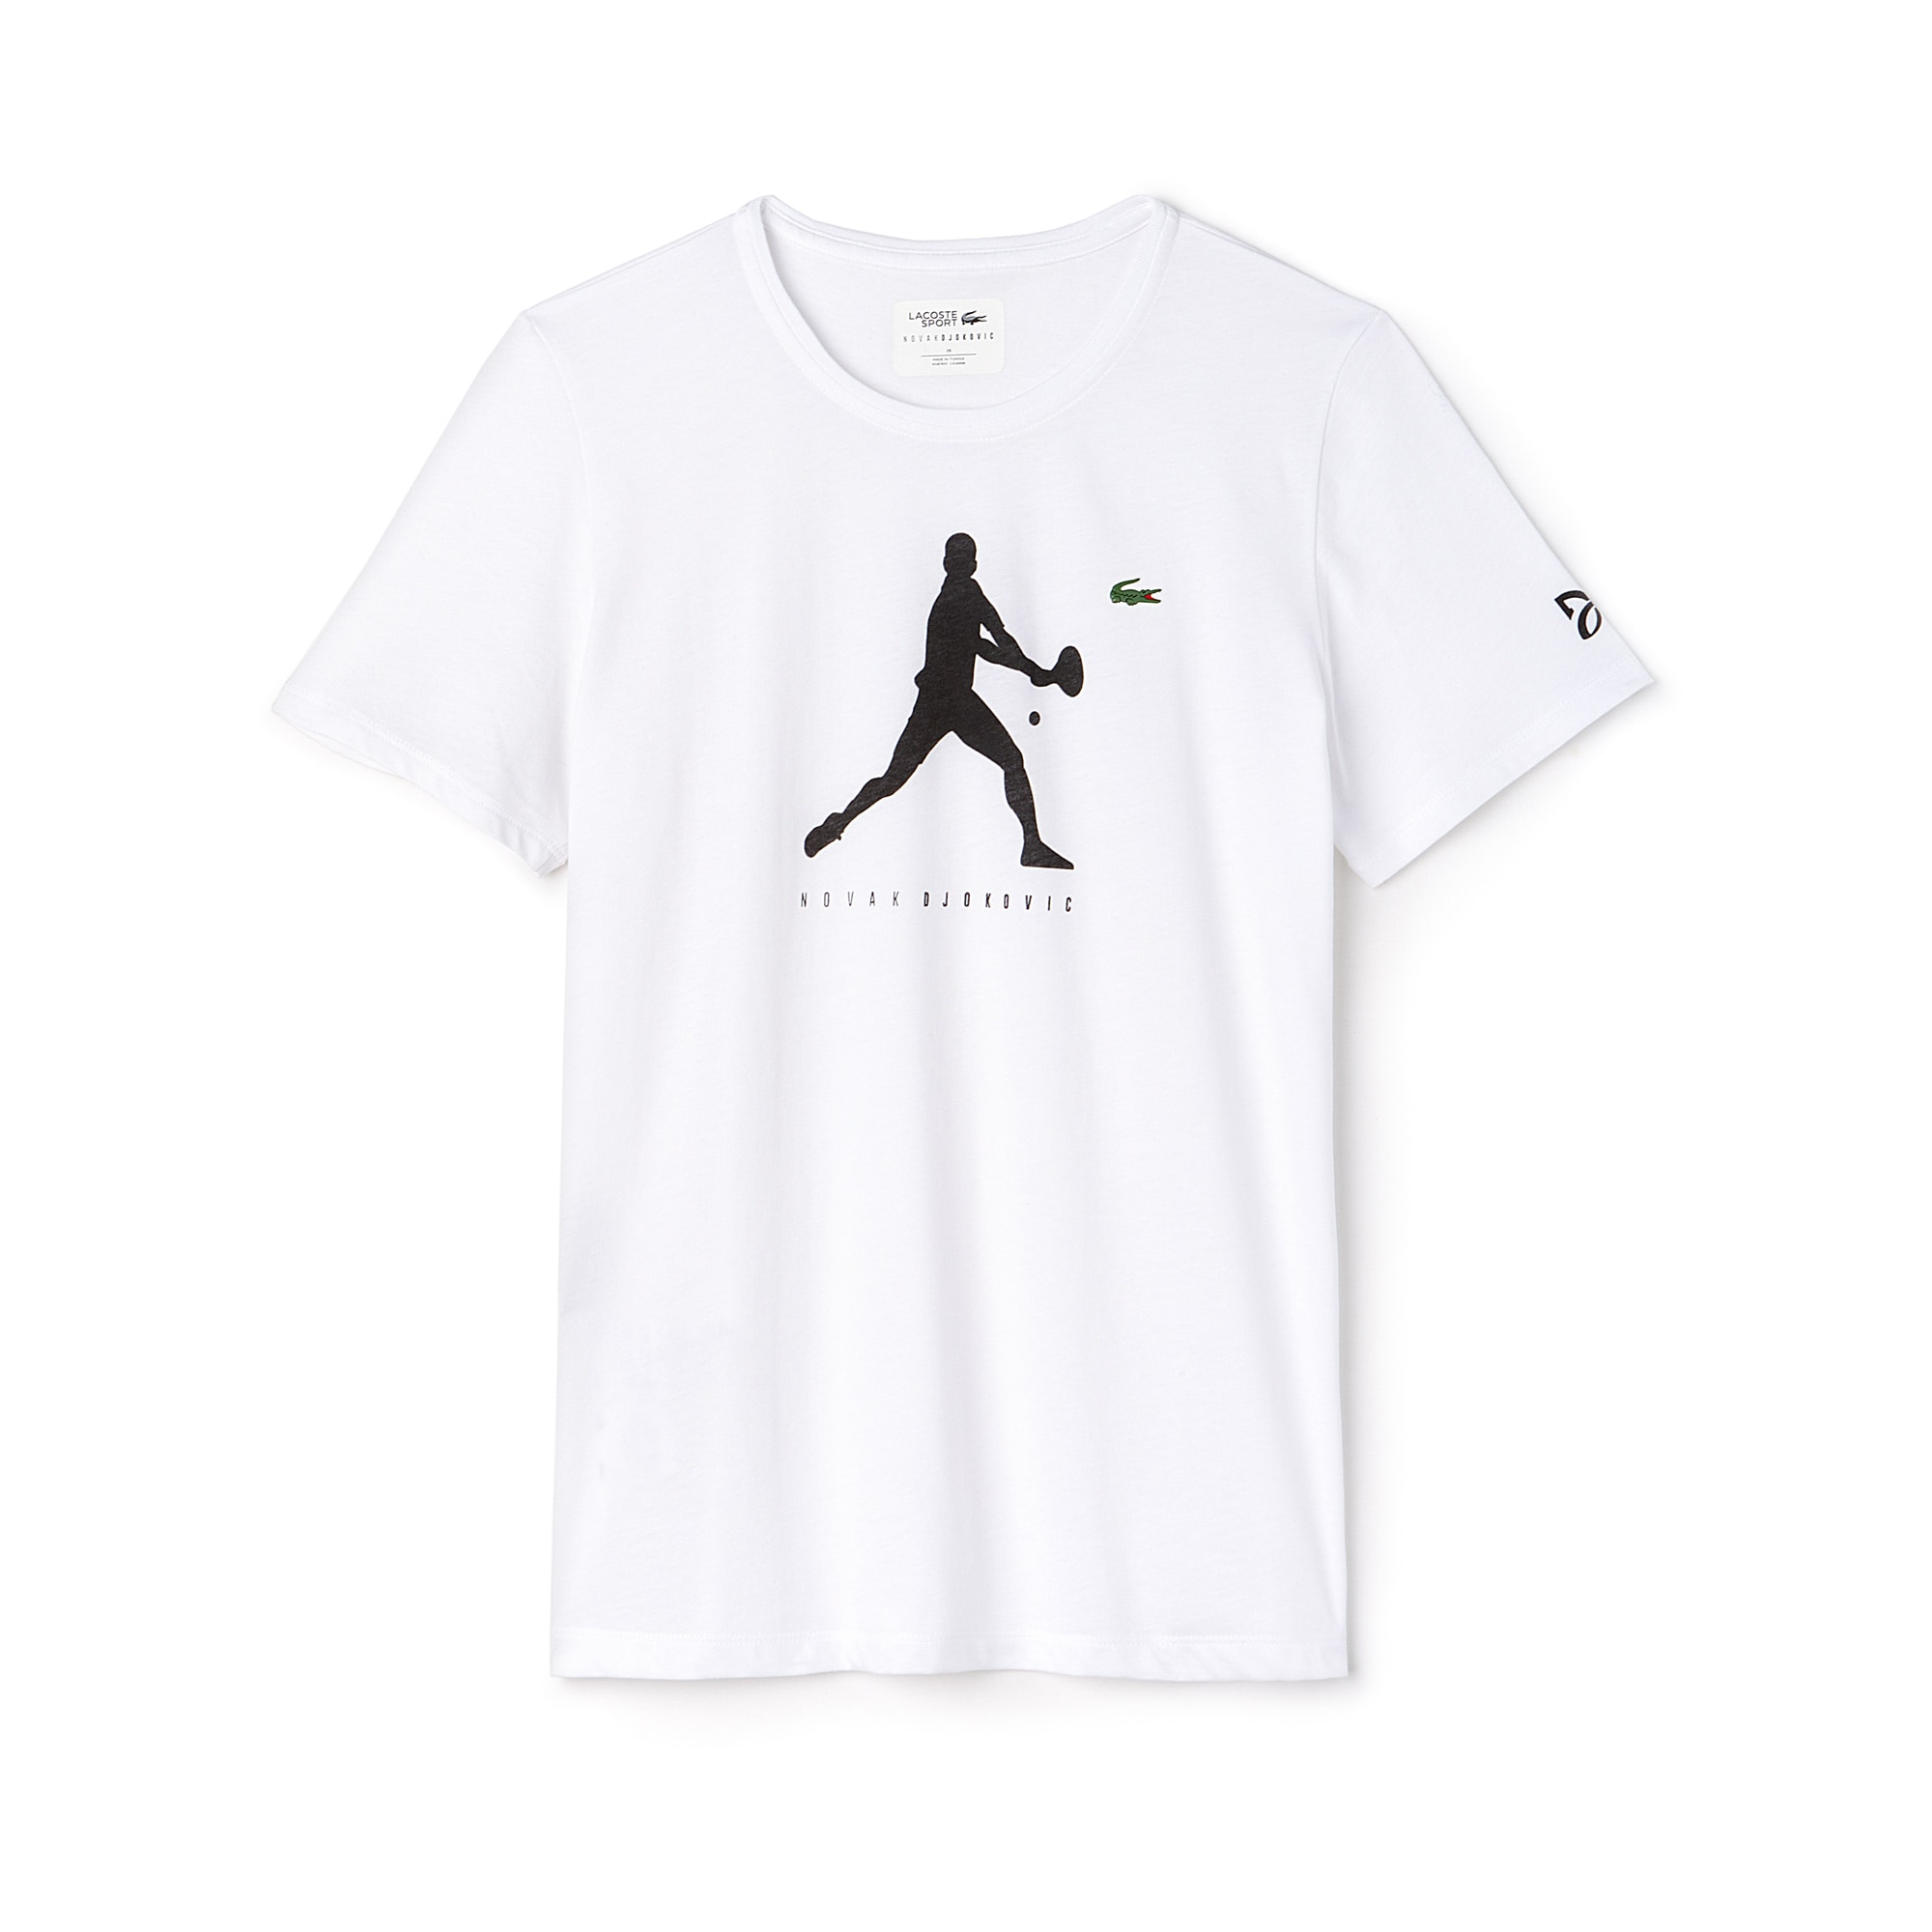 T-shirt col rond Lacoste SPORT COLLECTION NOVAK DJOKOVIC SUPPORT WITH STYLE en jersey uni avec imprimé